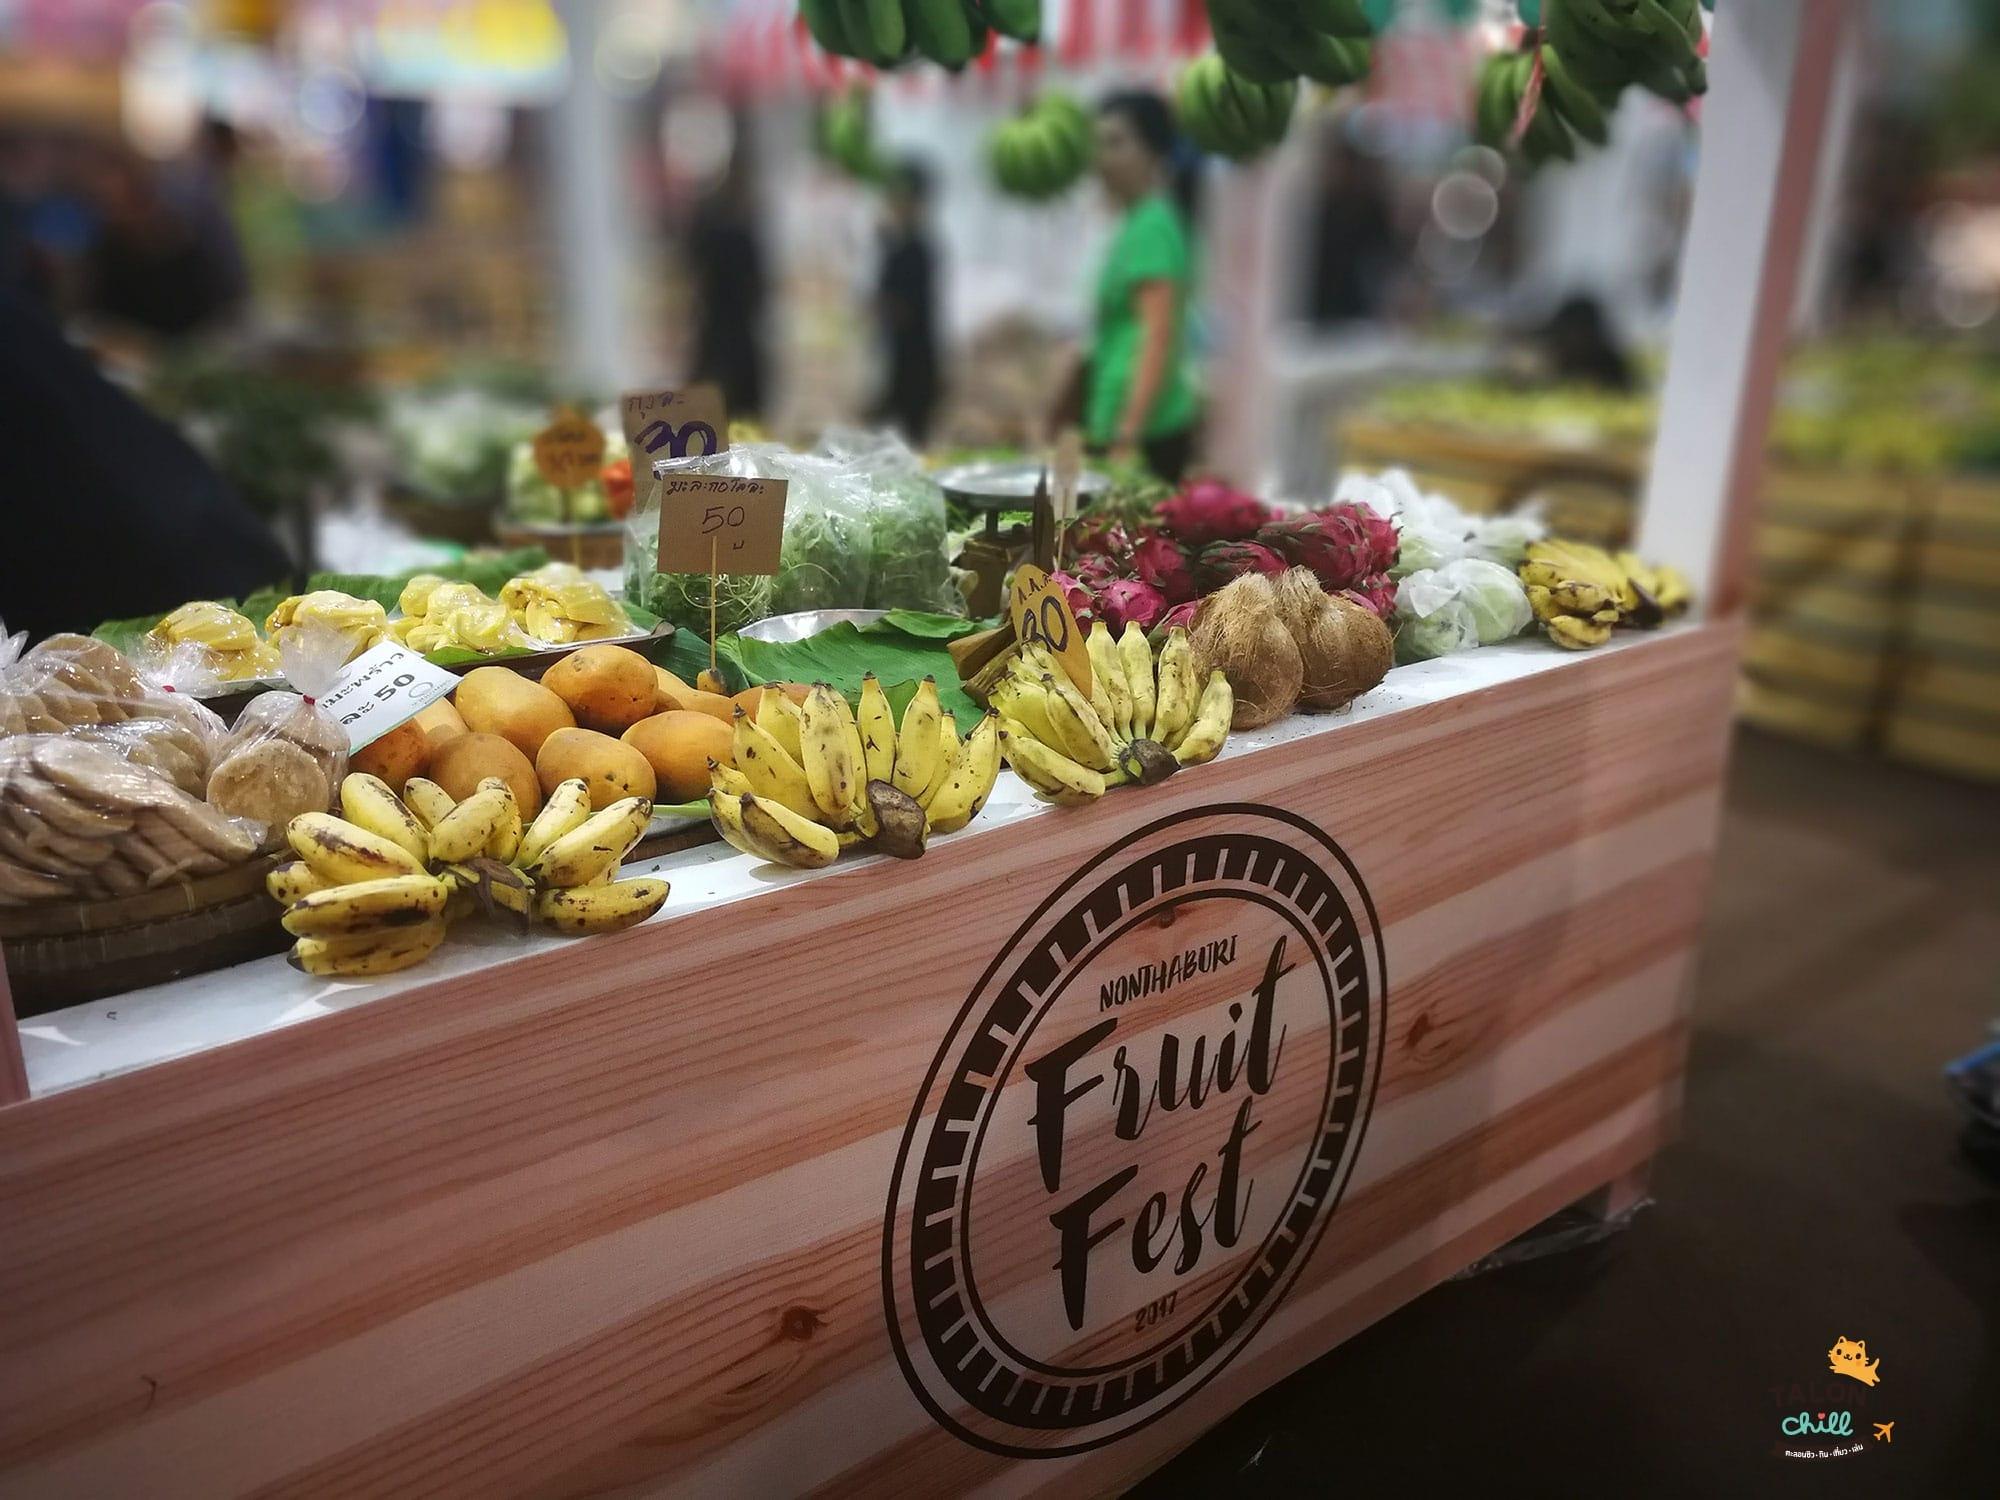 Nonthaburi Fruit Fest 2017 centralplaza rattanathibet 13